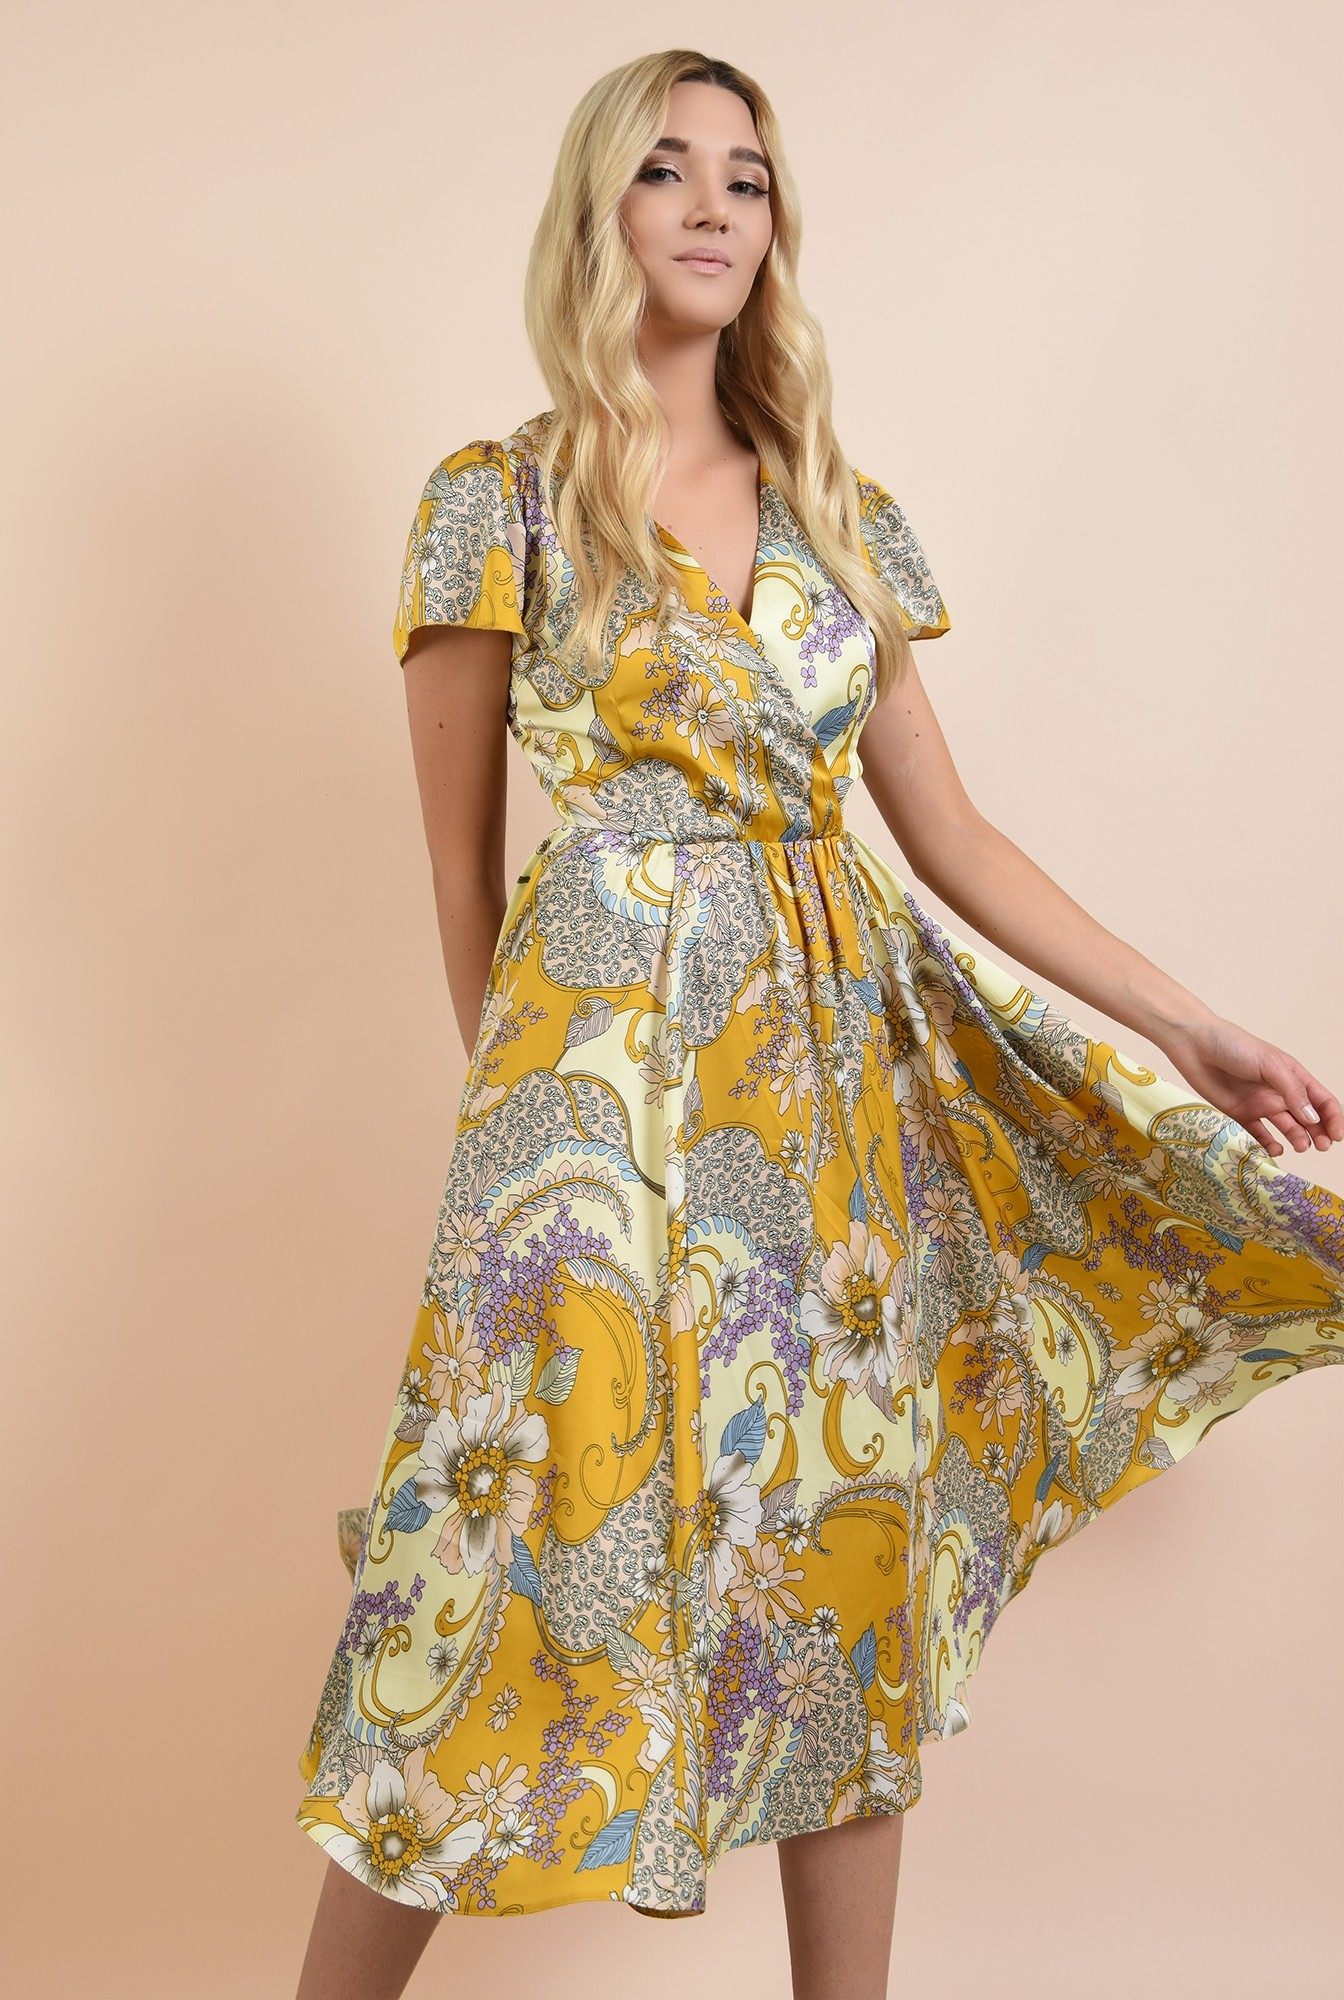 0 - rochie de seara, clos, cu flori, anchior petrecut, maneci fluture